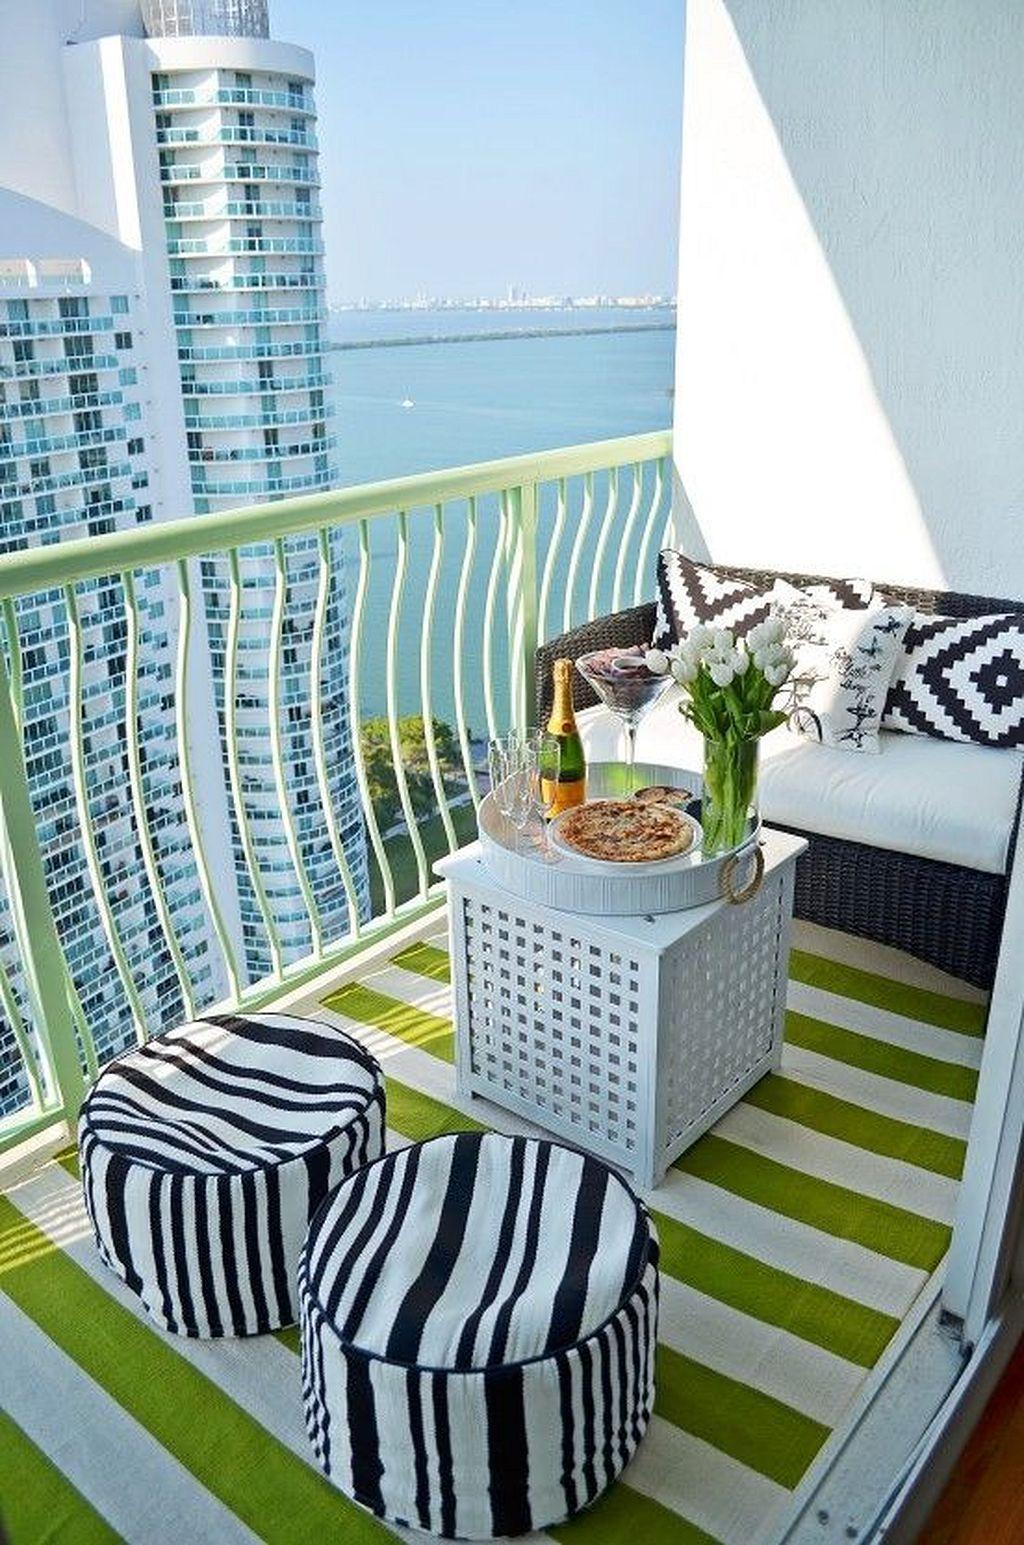 Gorgeous 30 tiny furniture ideas for your small patio https kidmagz